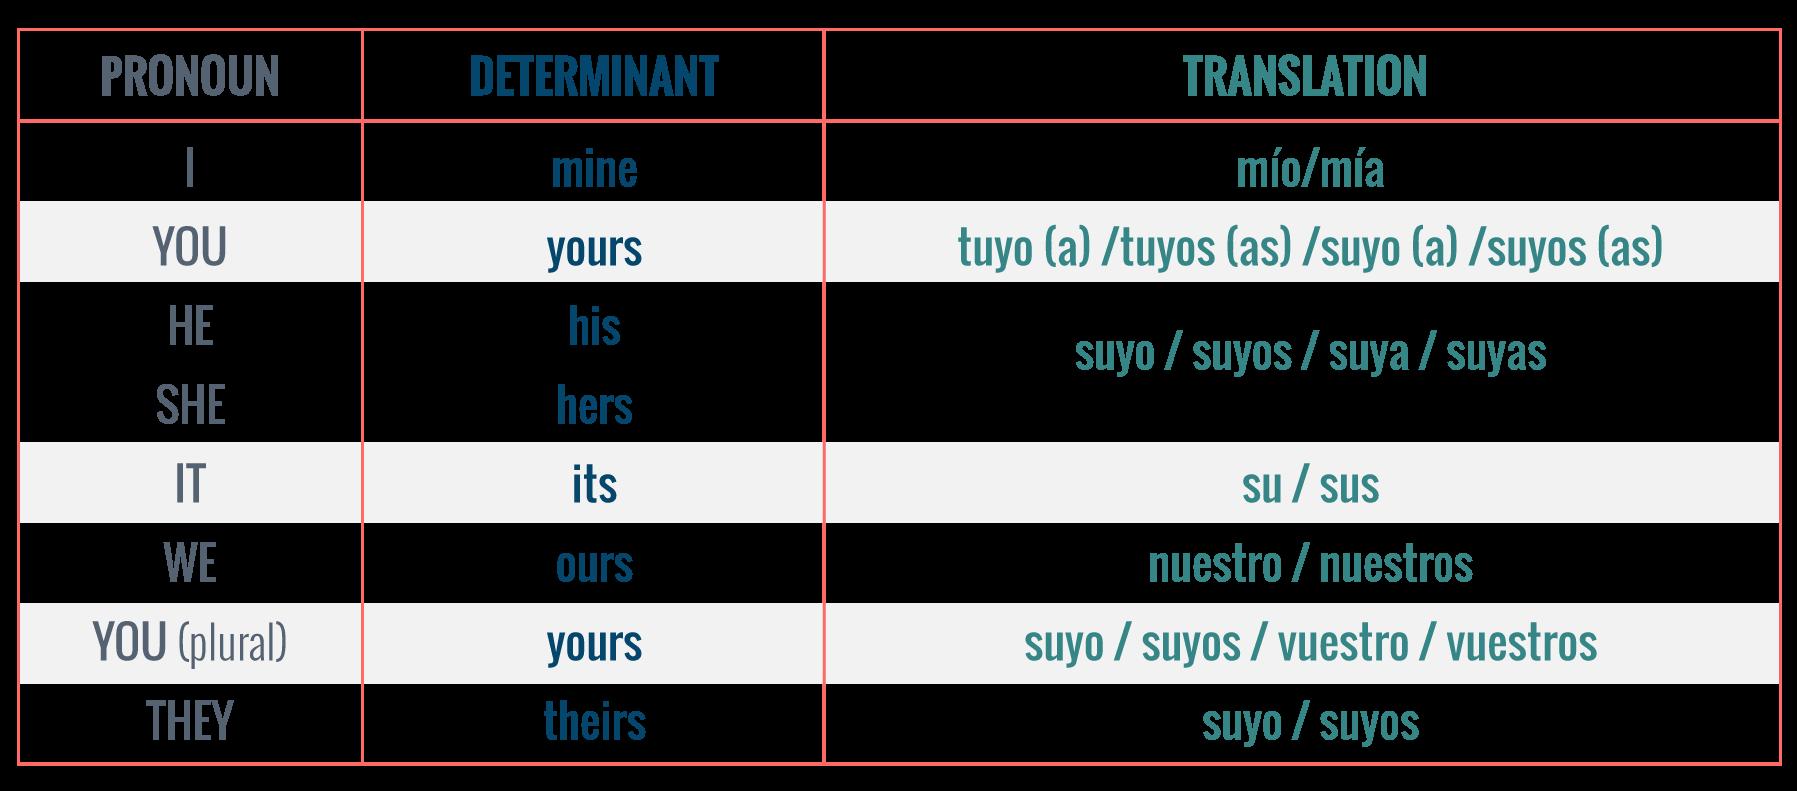 Tabla de pronombres posesivos.